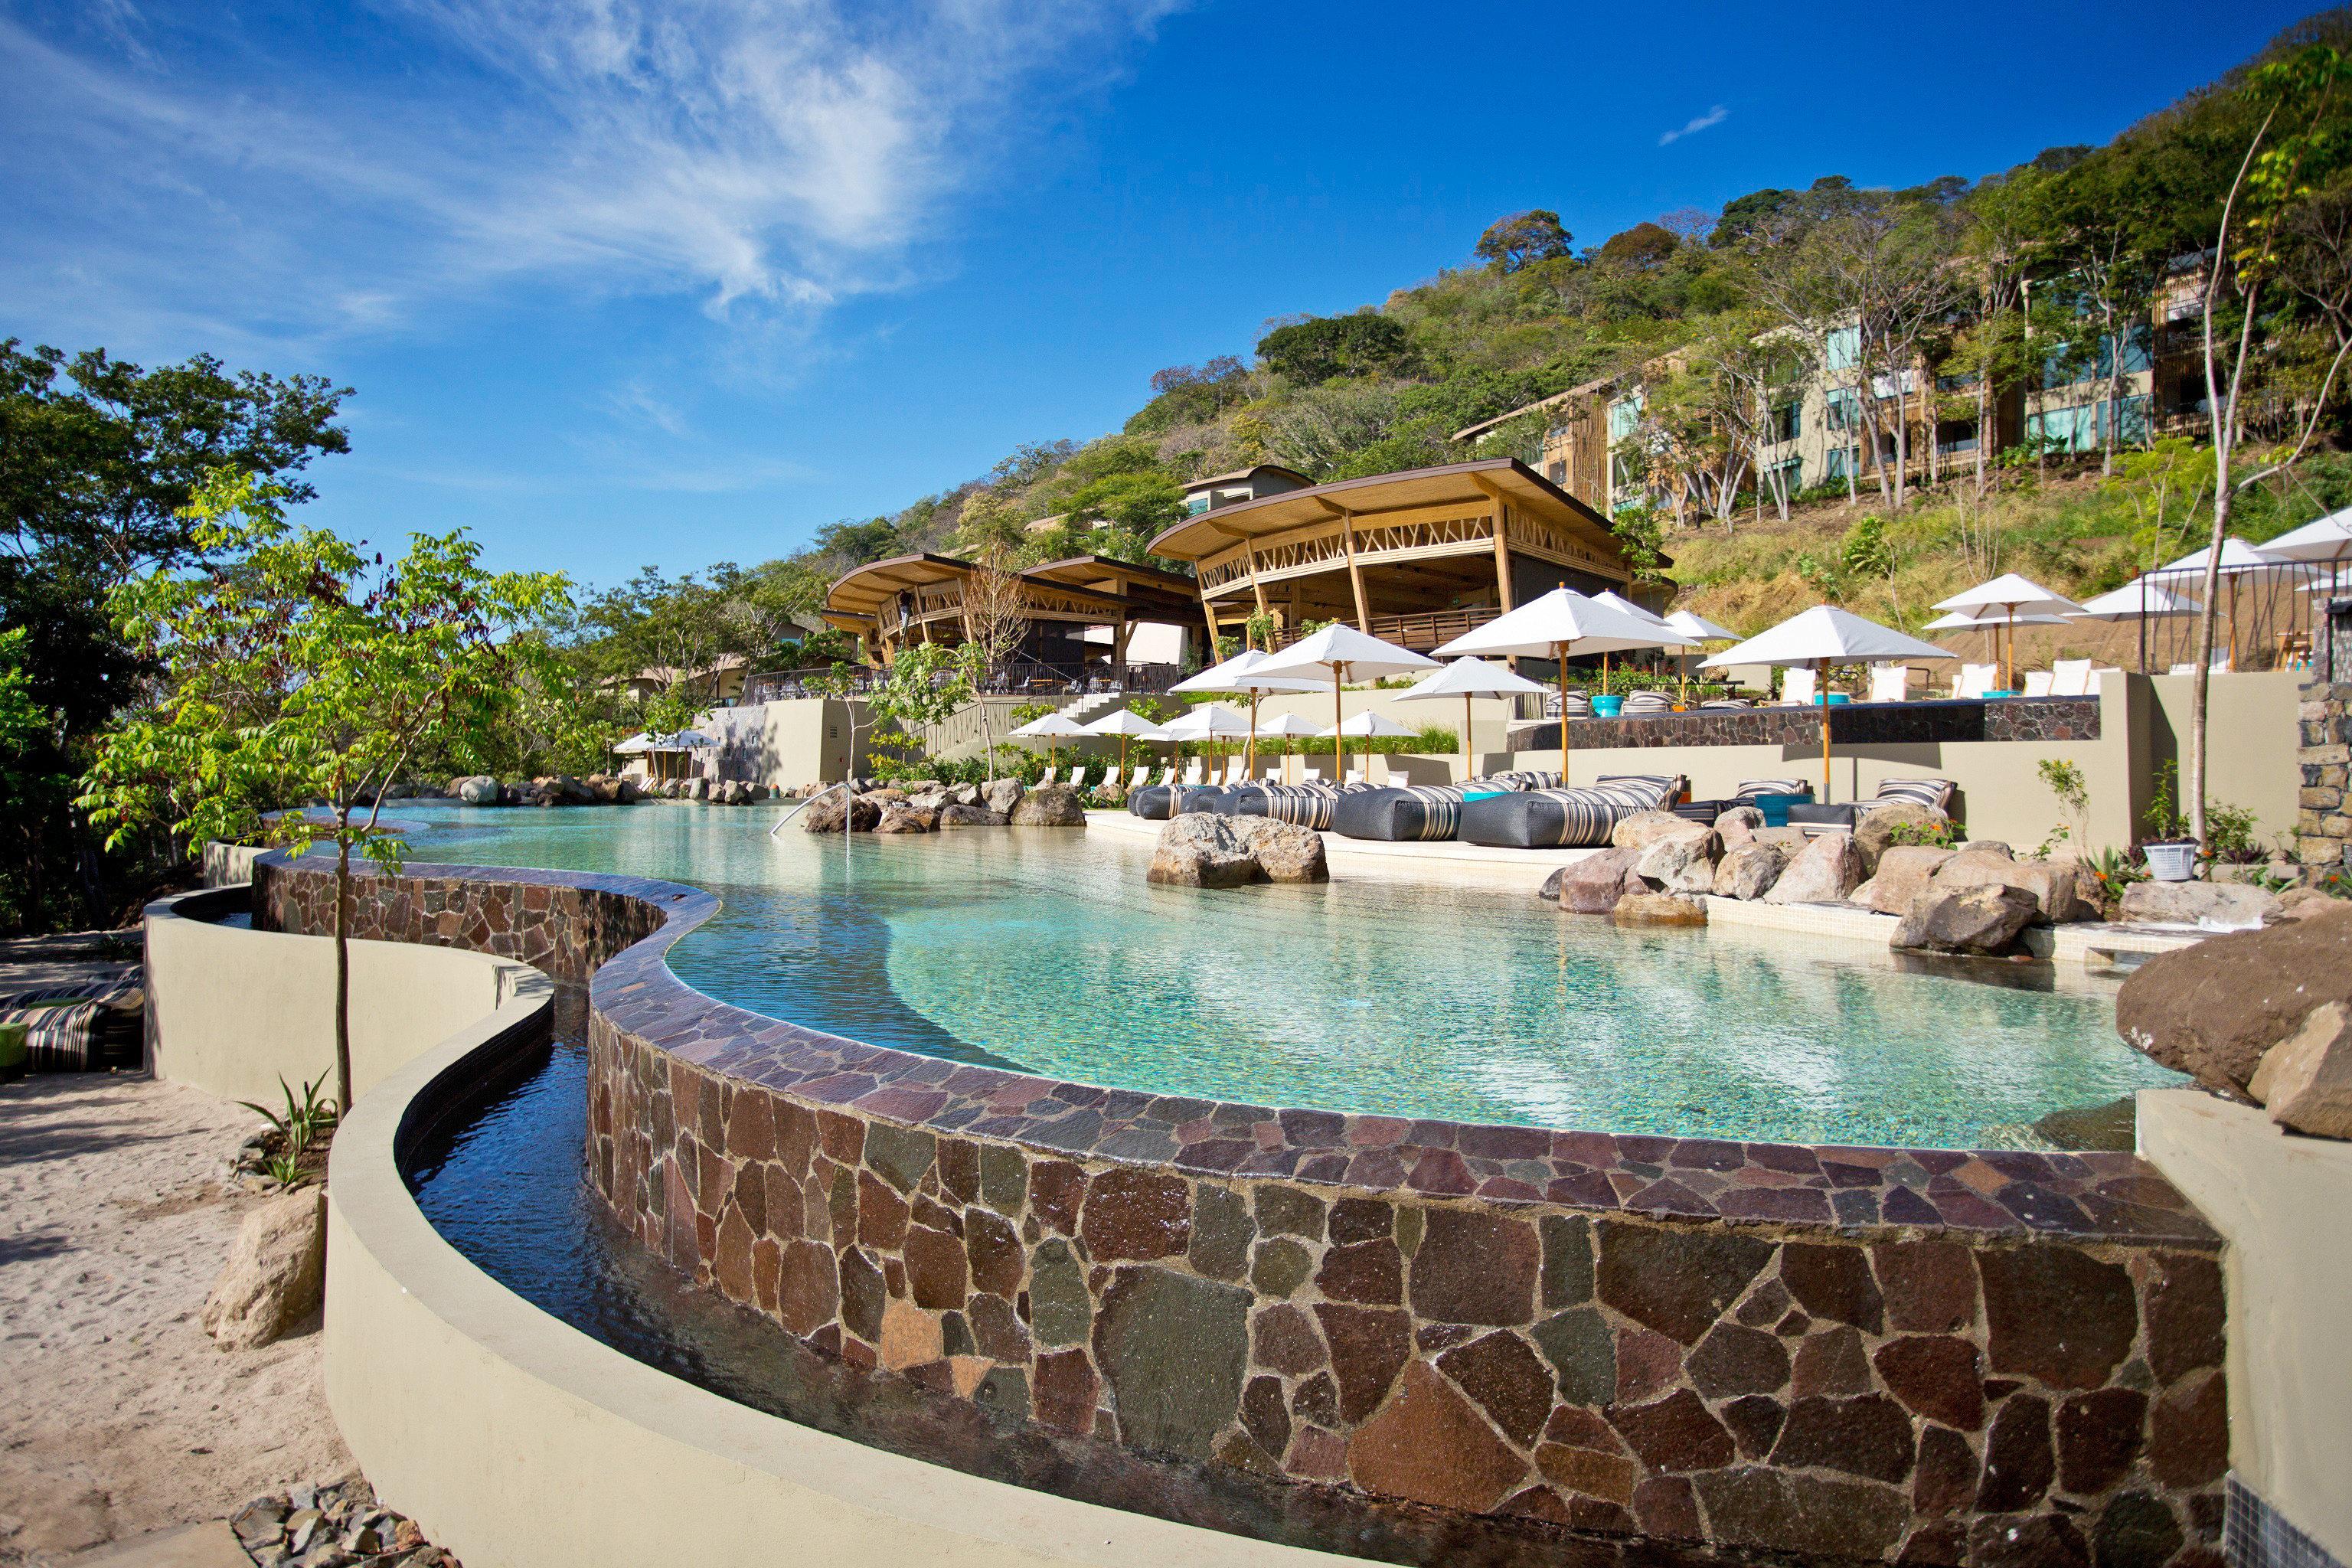 Hotels Pool Resort Scenic views sky outdoor swimming pool leisure property vacation estate resort town Village Villa bay Lagoon stone Garden